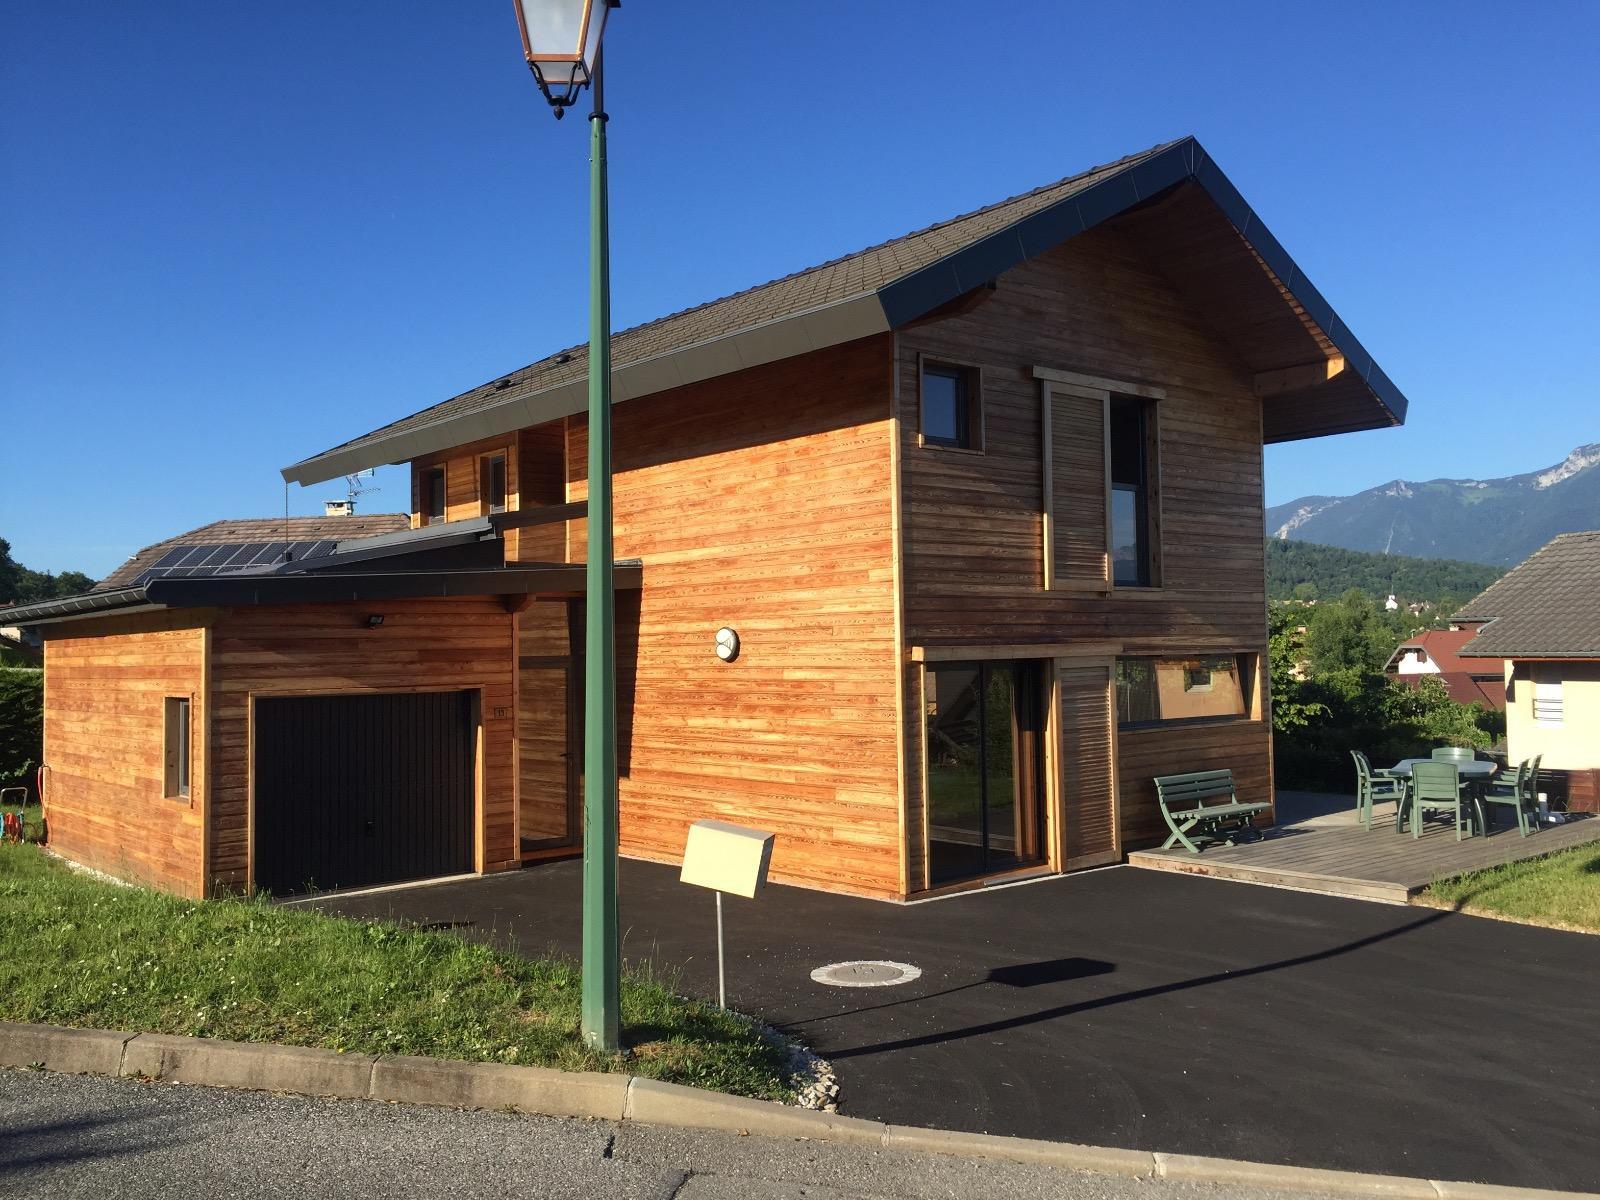 Maison bois Metz-Tessy - V585